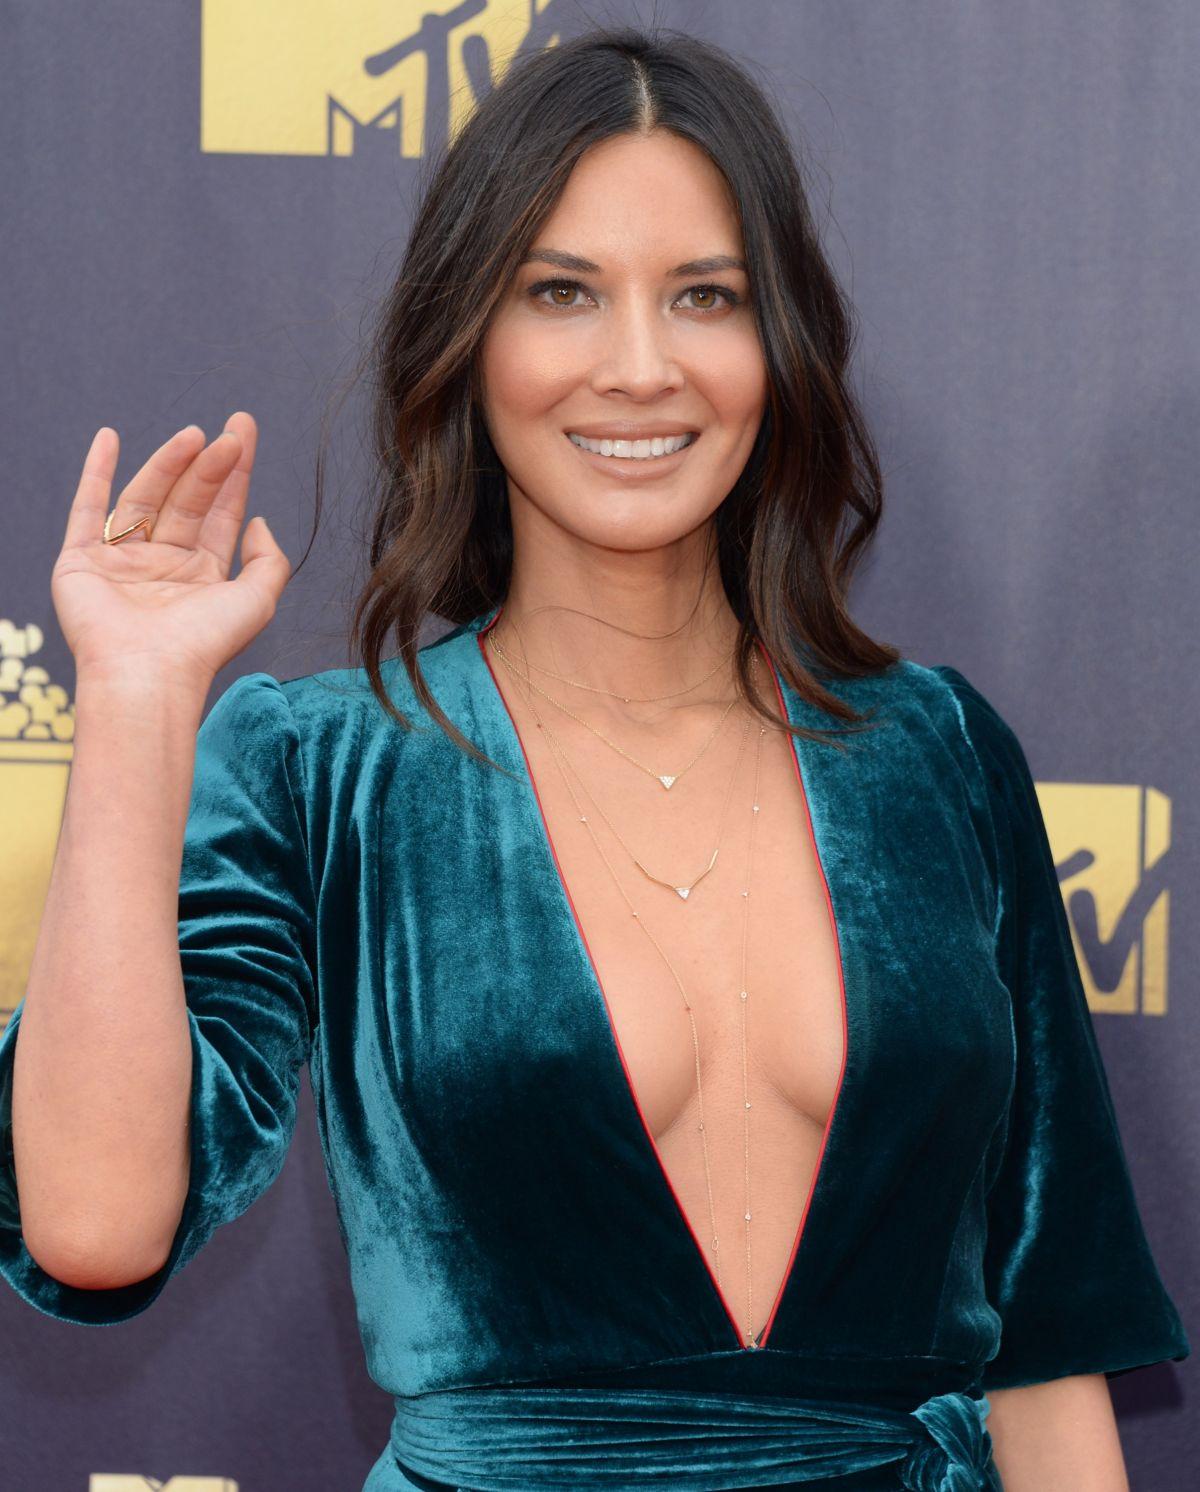 OLIVIA MUNN at 2018 MTV Movie and TV Awards in Santa ... Olivia Munn